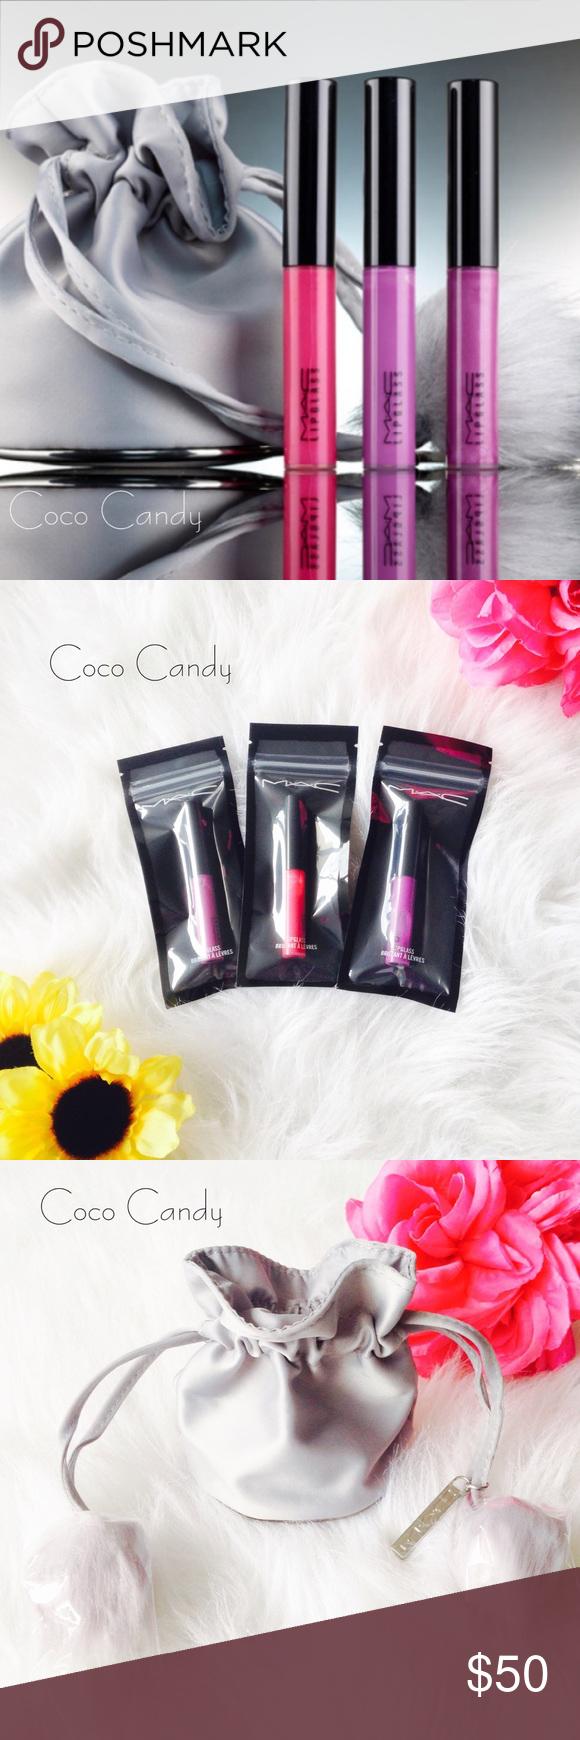 MAC Cosmetics Gift Set Boutique | Cosmetic gift set, Mac ...